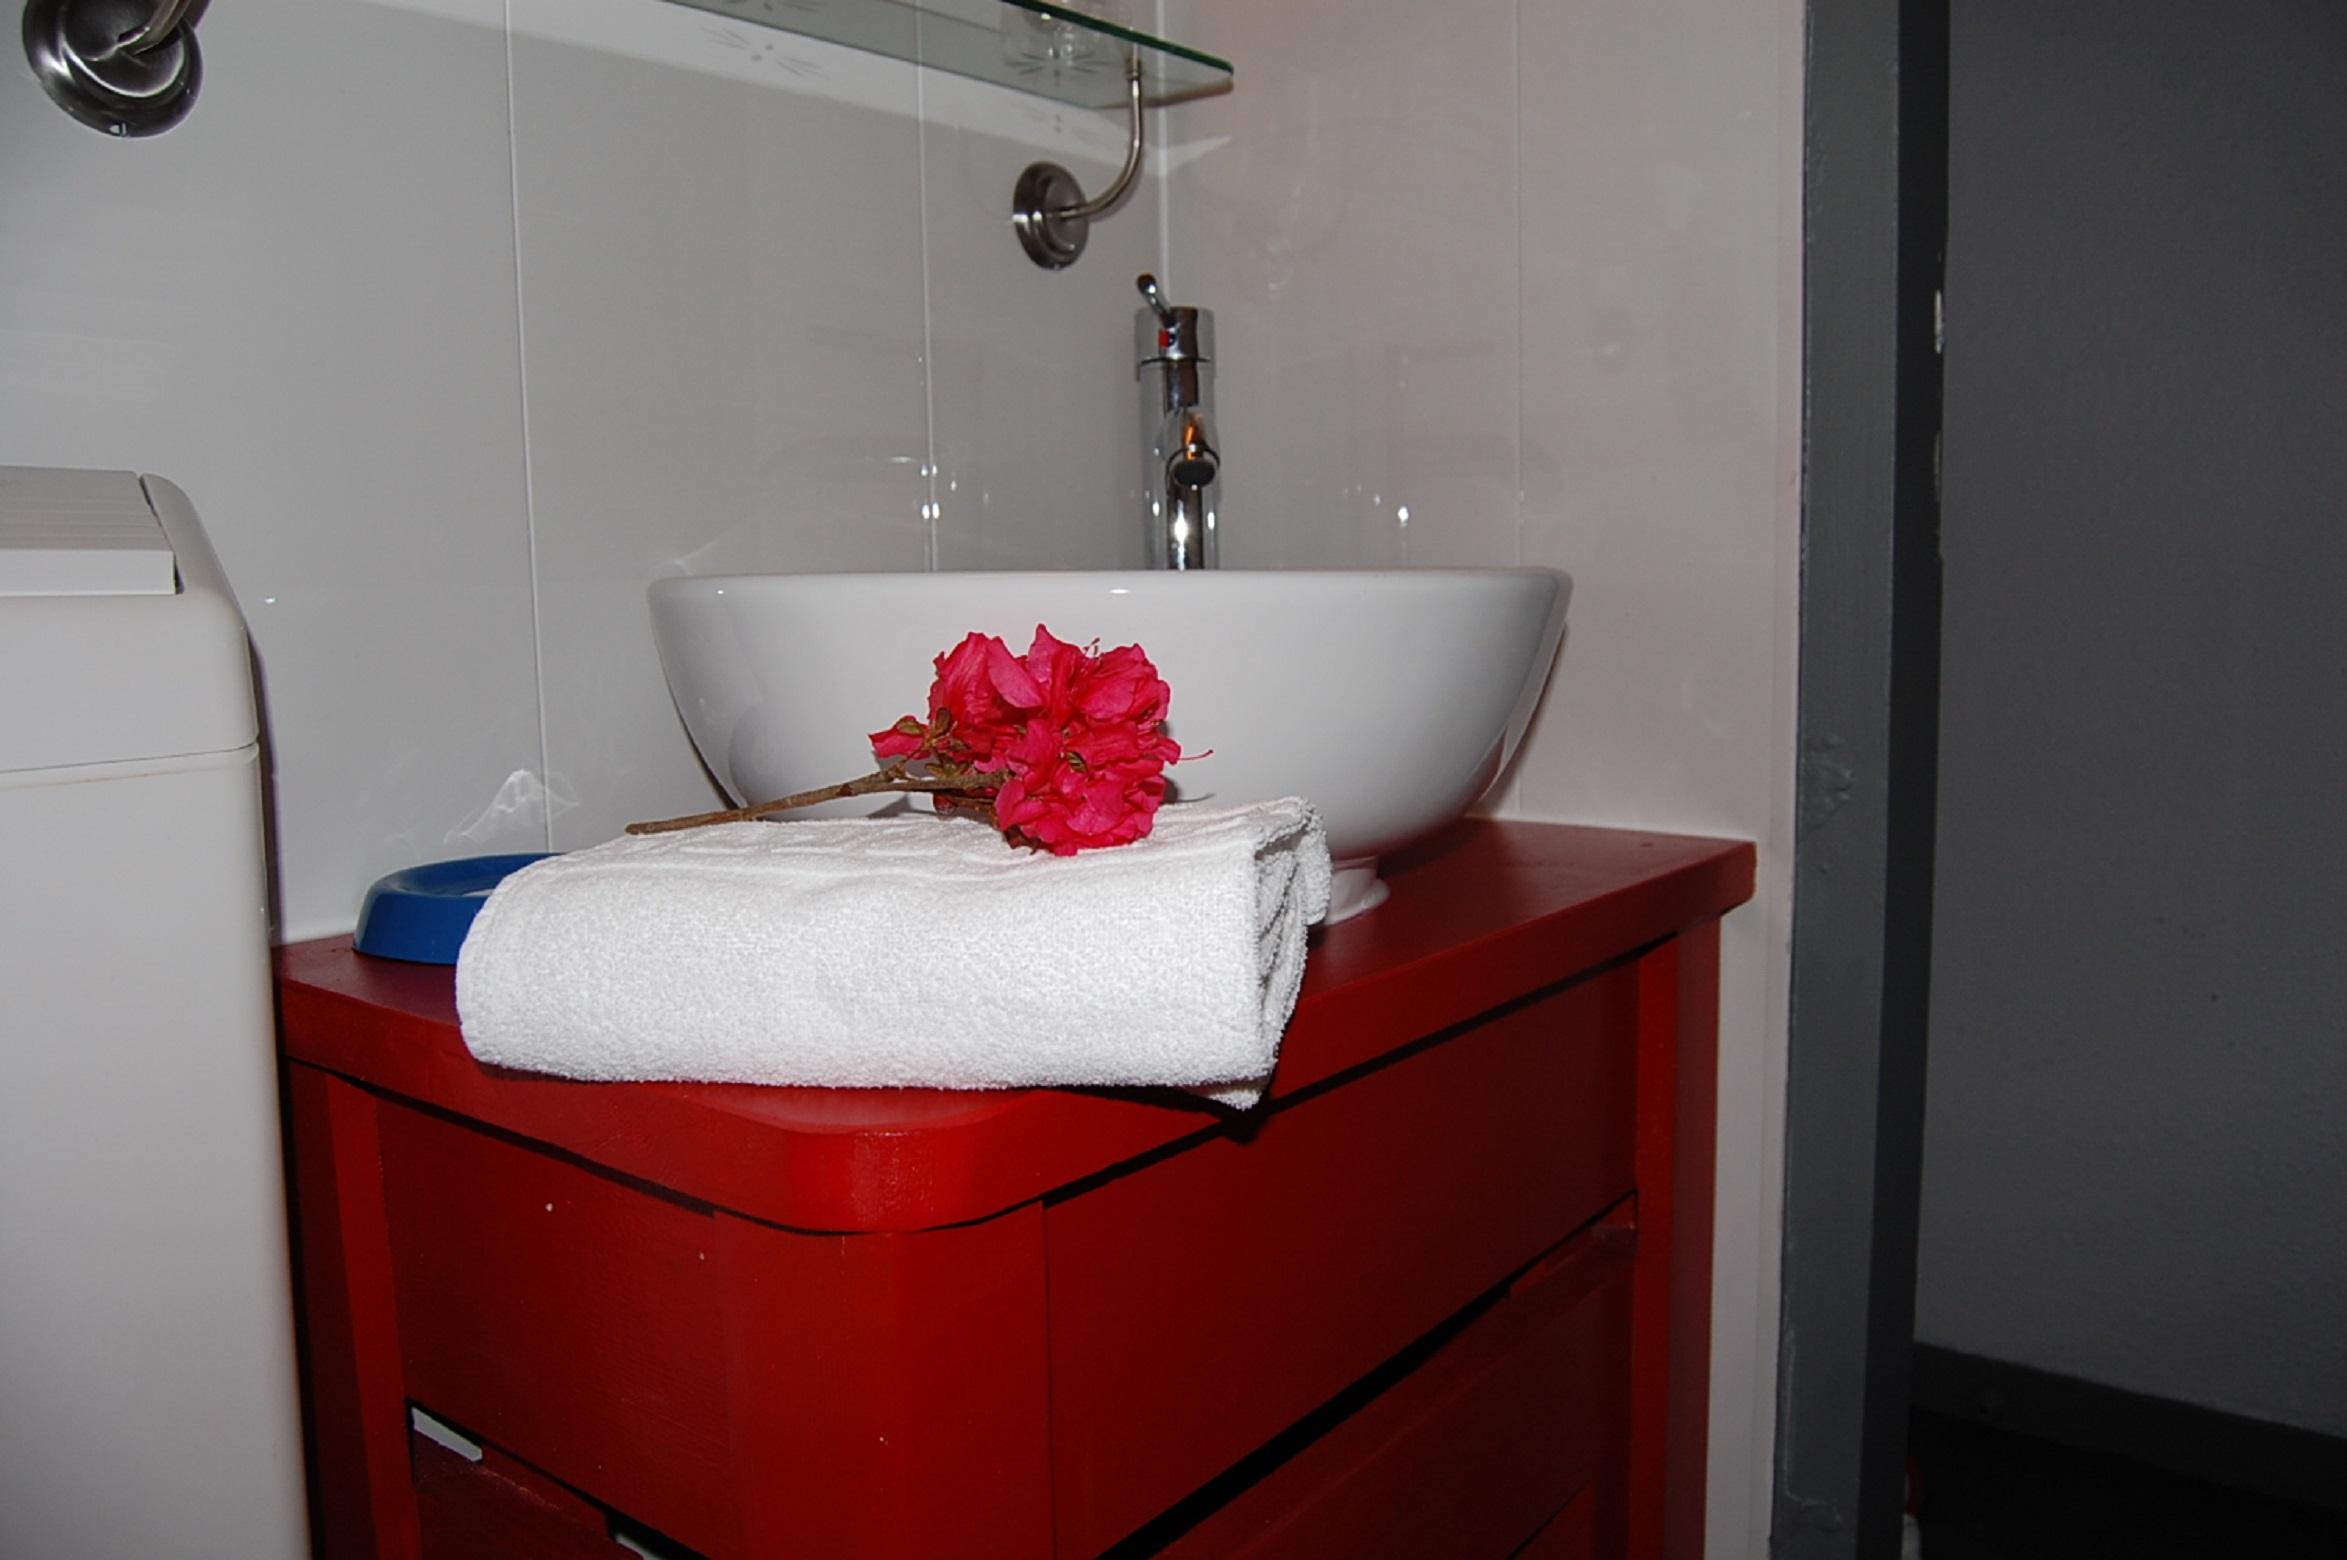 Chambre Hotel Bassin D Arcachon Pas Cher Ar S Andernos Les Bains